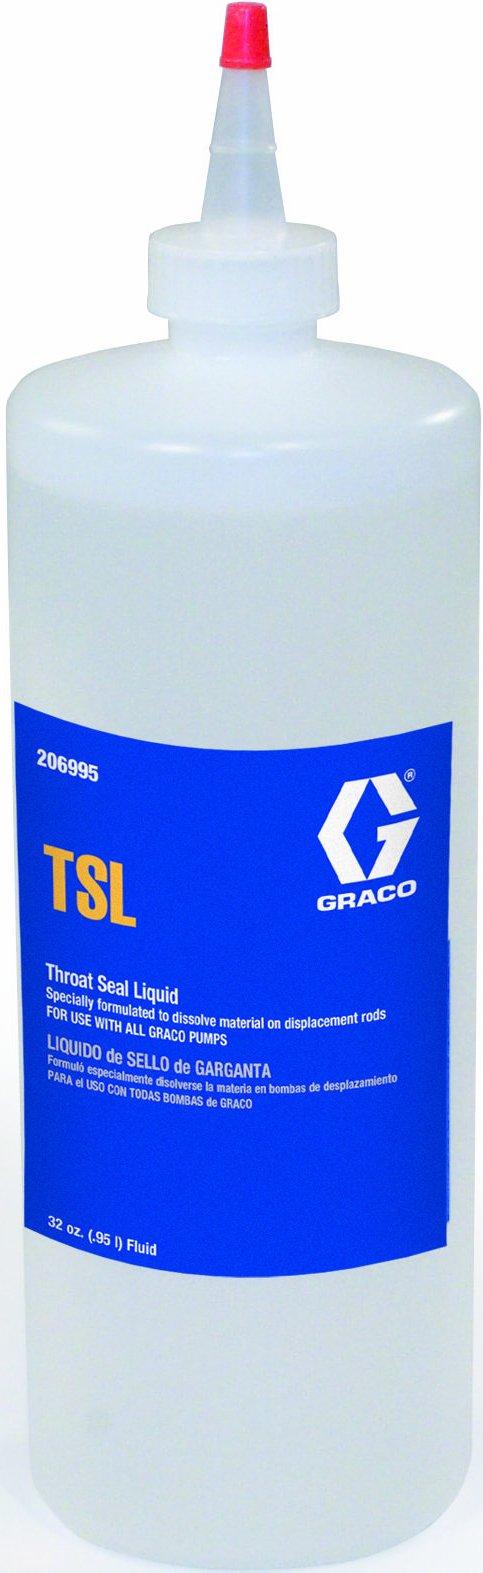 Graco 206995 32-Ounce Throat Seal Liquid for Airless Paint Spray Guns